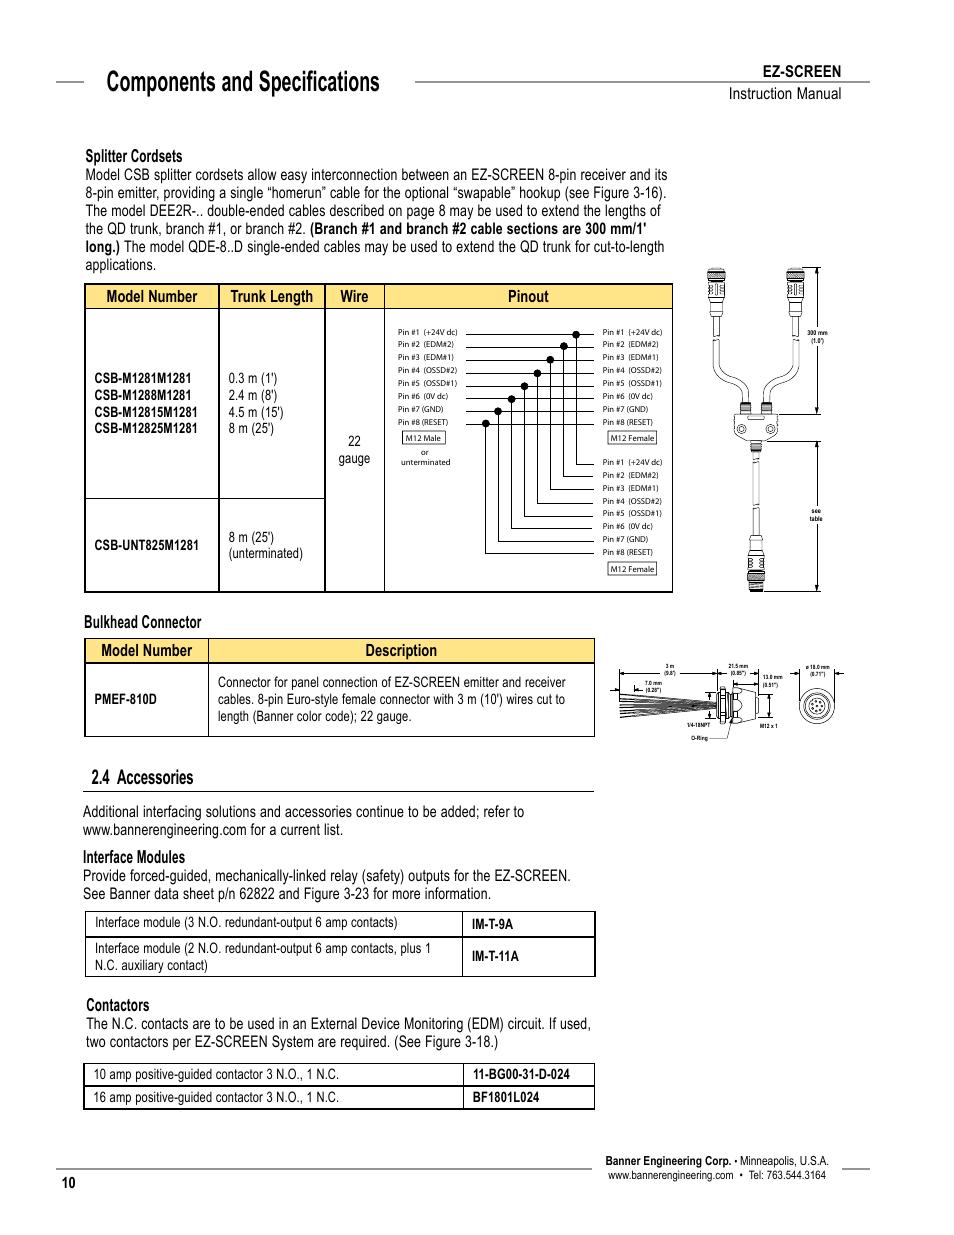 Banner Light Curtain Error Code 13 Design Lajada Rh Co 2009 EZ Go Wiring Diagram Ez Screen Ls